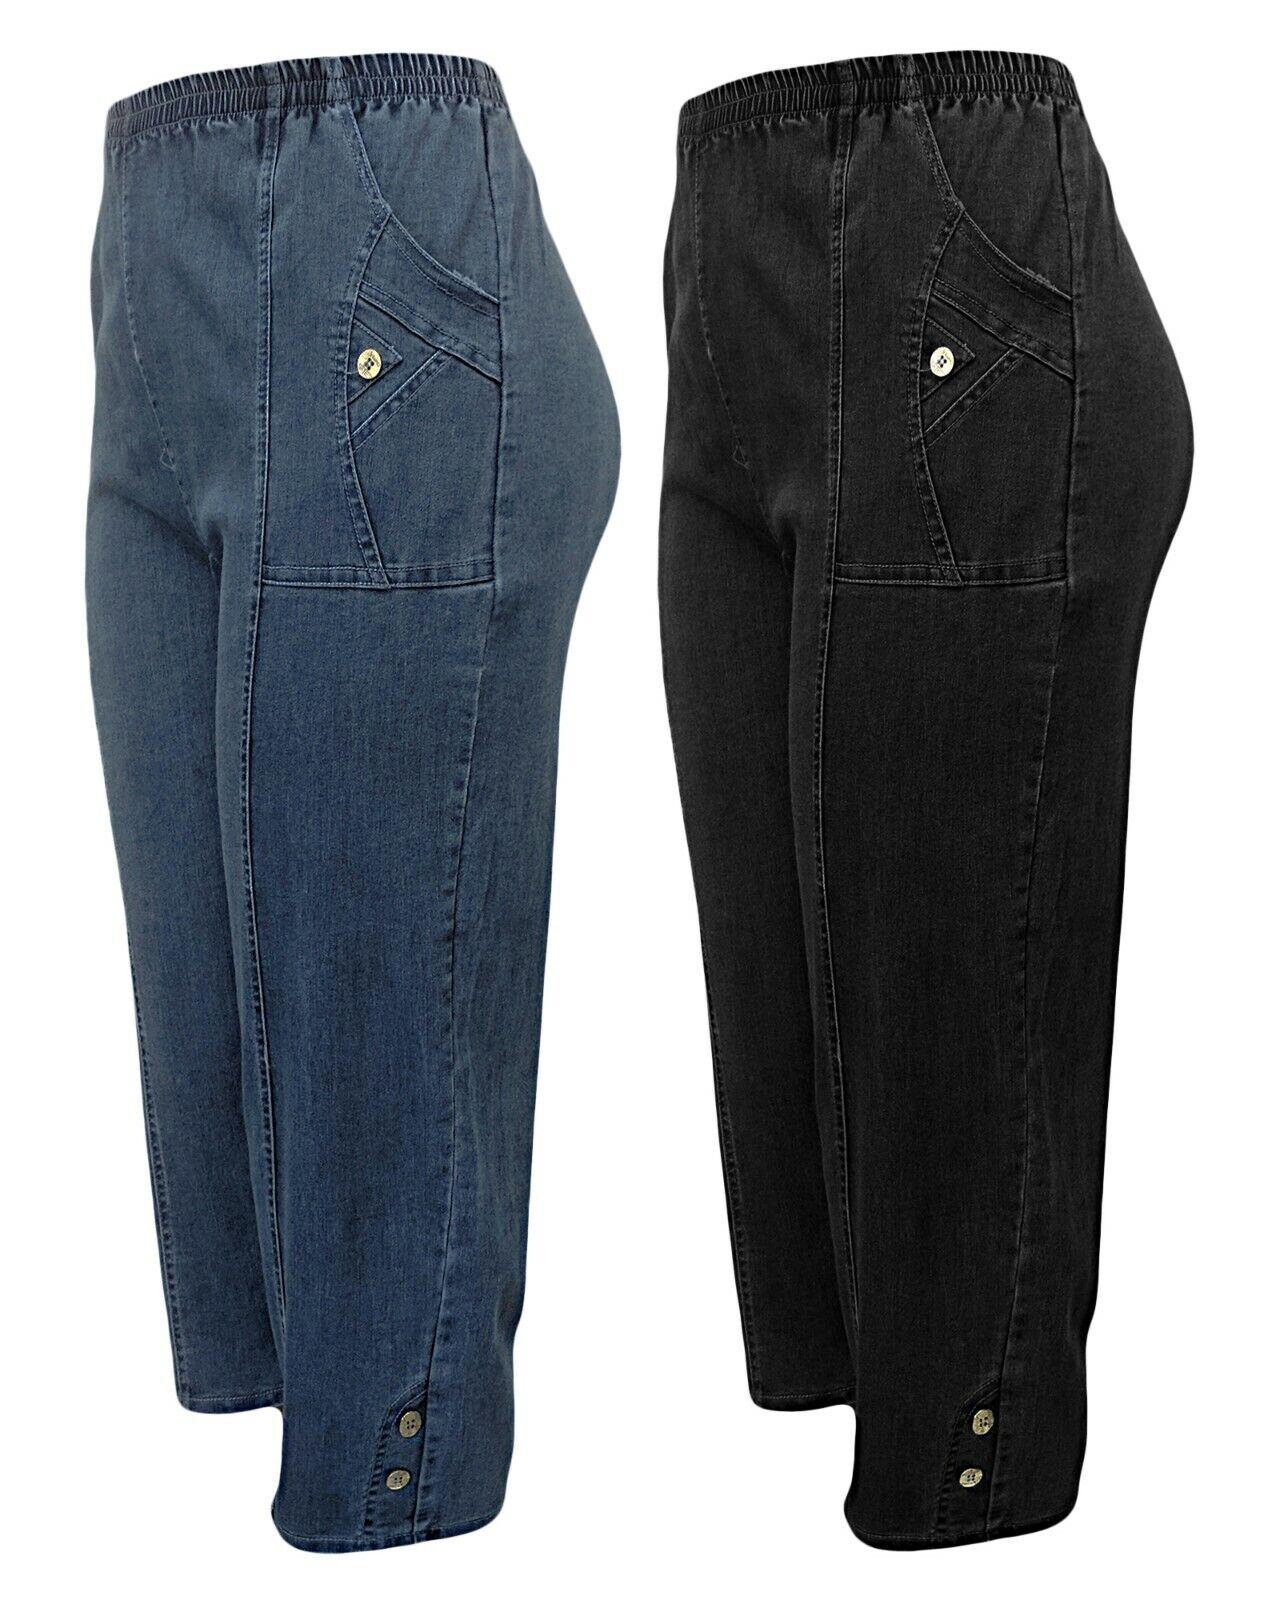 f9c08c261af83f kurze Damen Jeanshose Gummizug 7/8 Schlupfhose - Caprihose - locker  geschnitten*